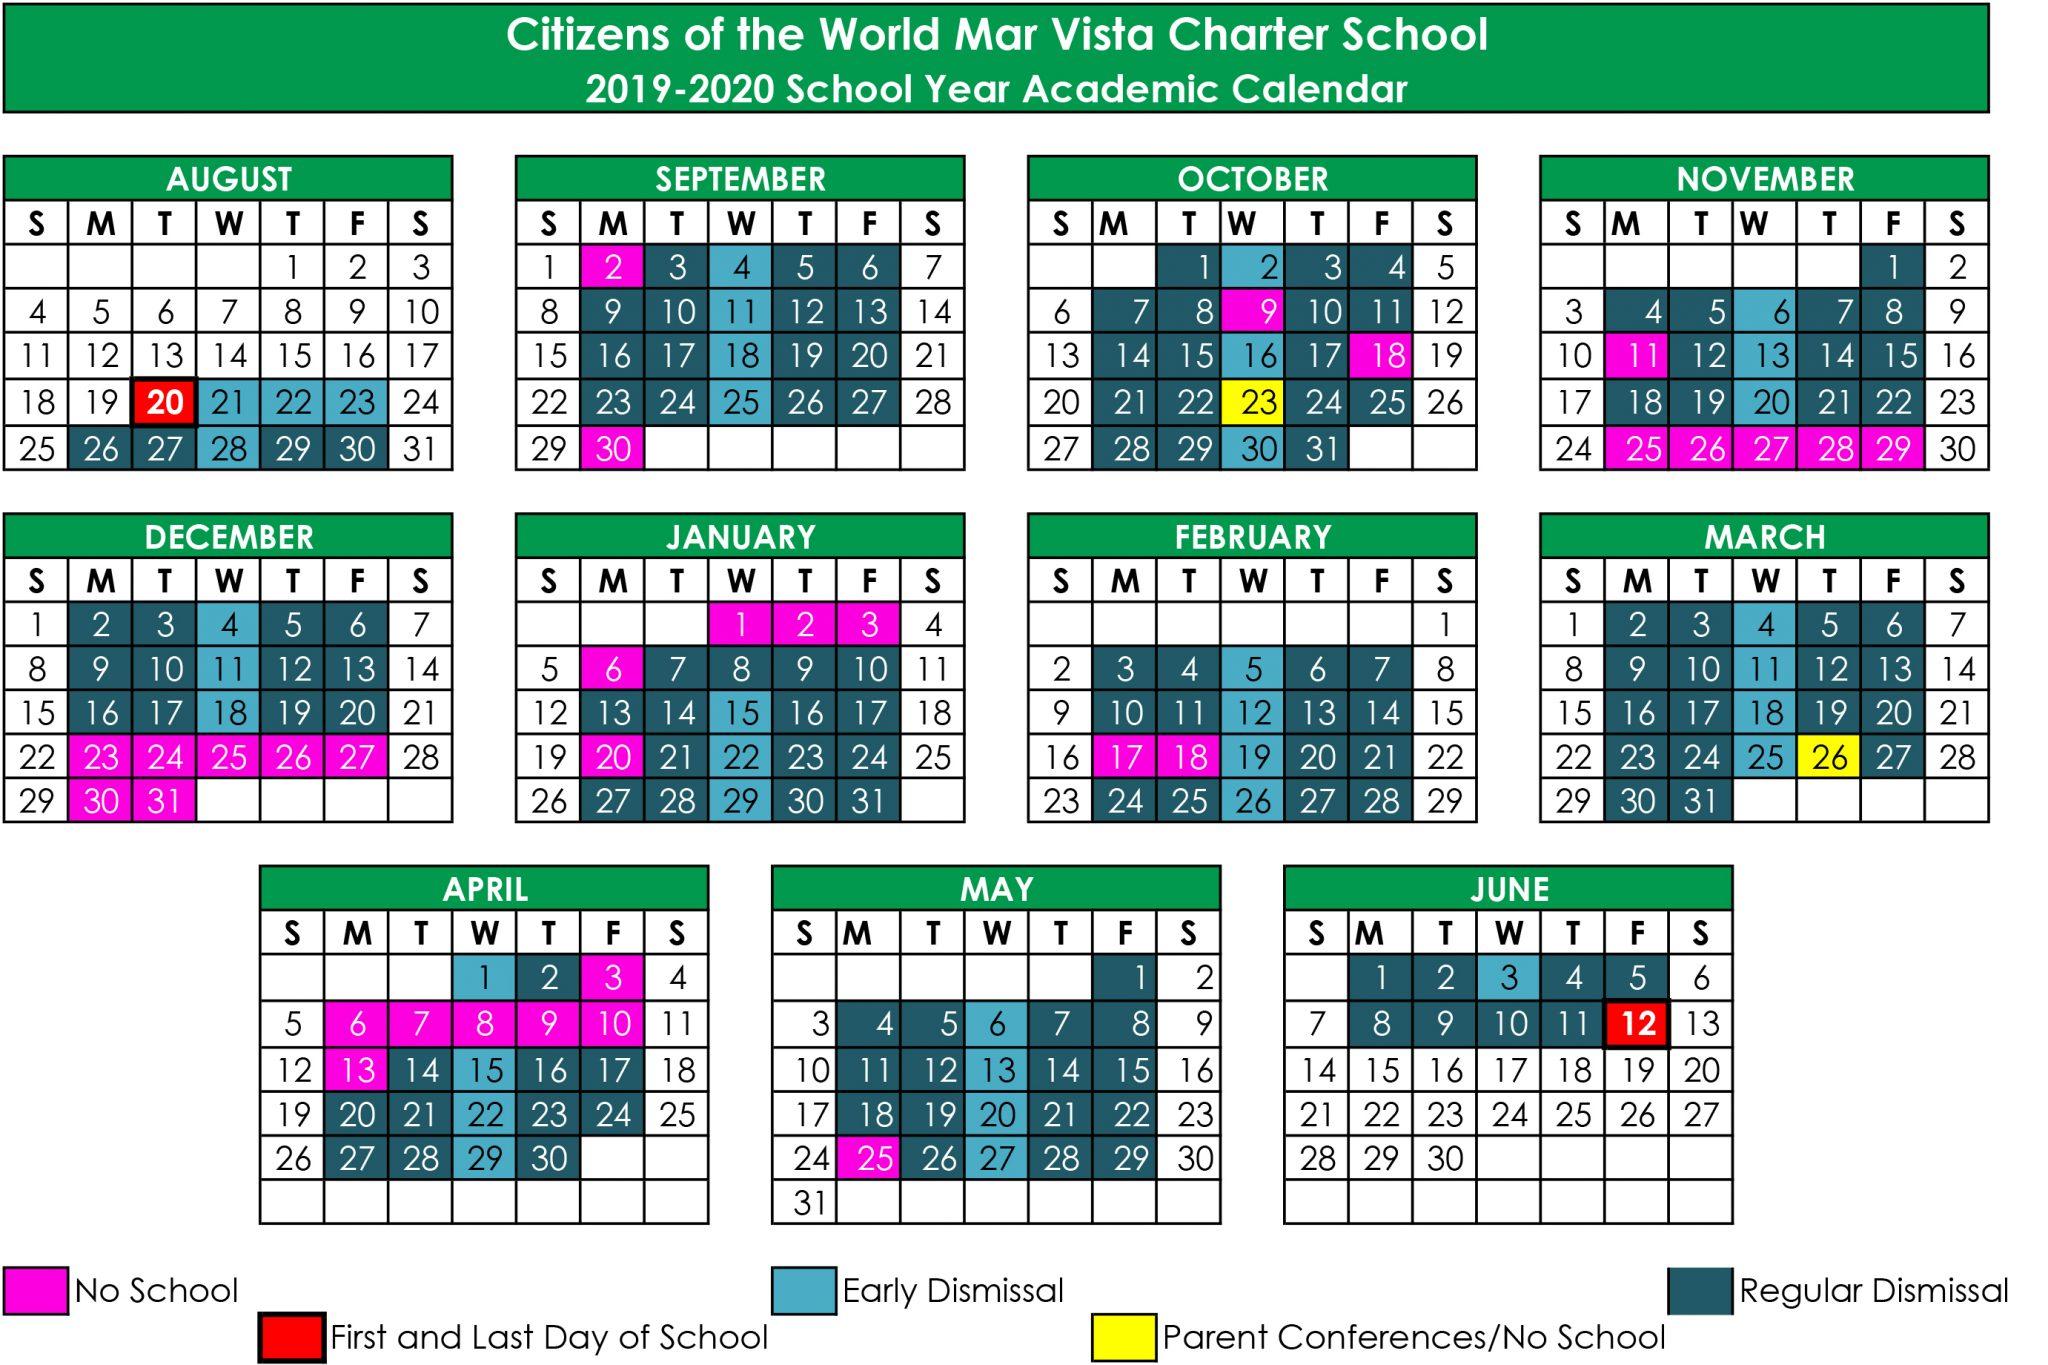 School Calendar | Cwc Mar Vista With Oxnard High School Calendar 2021